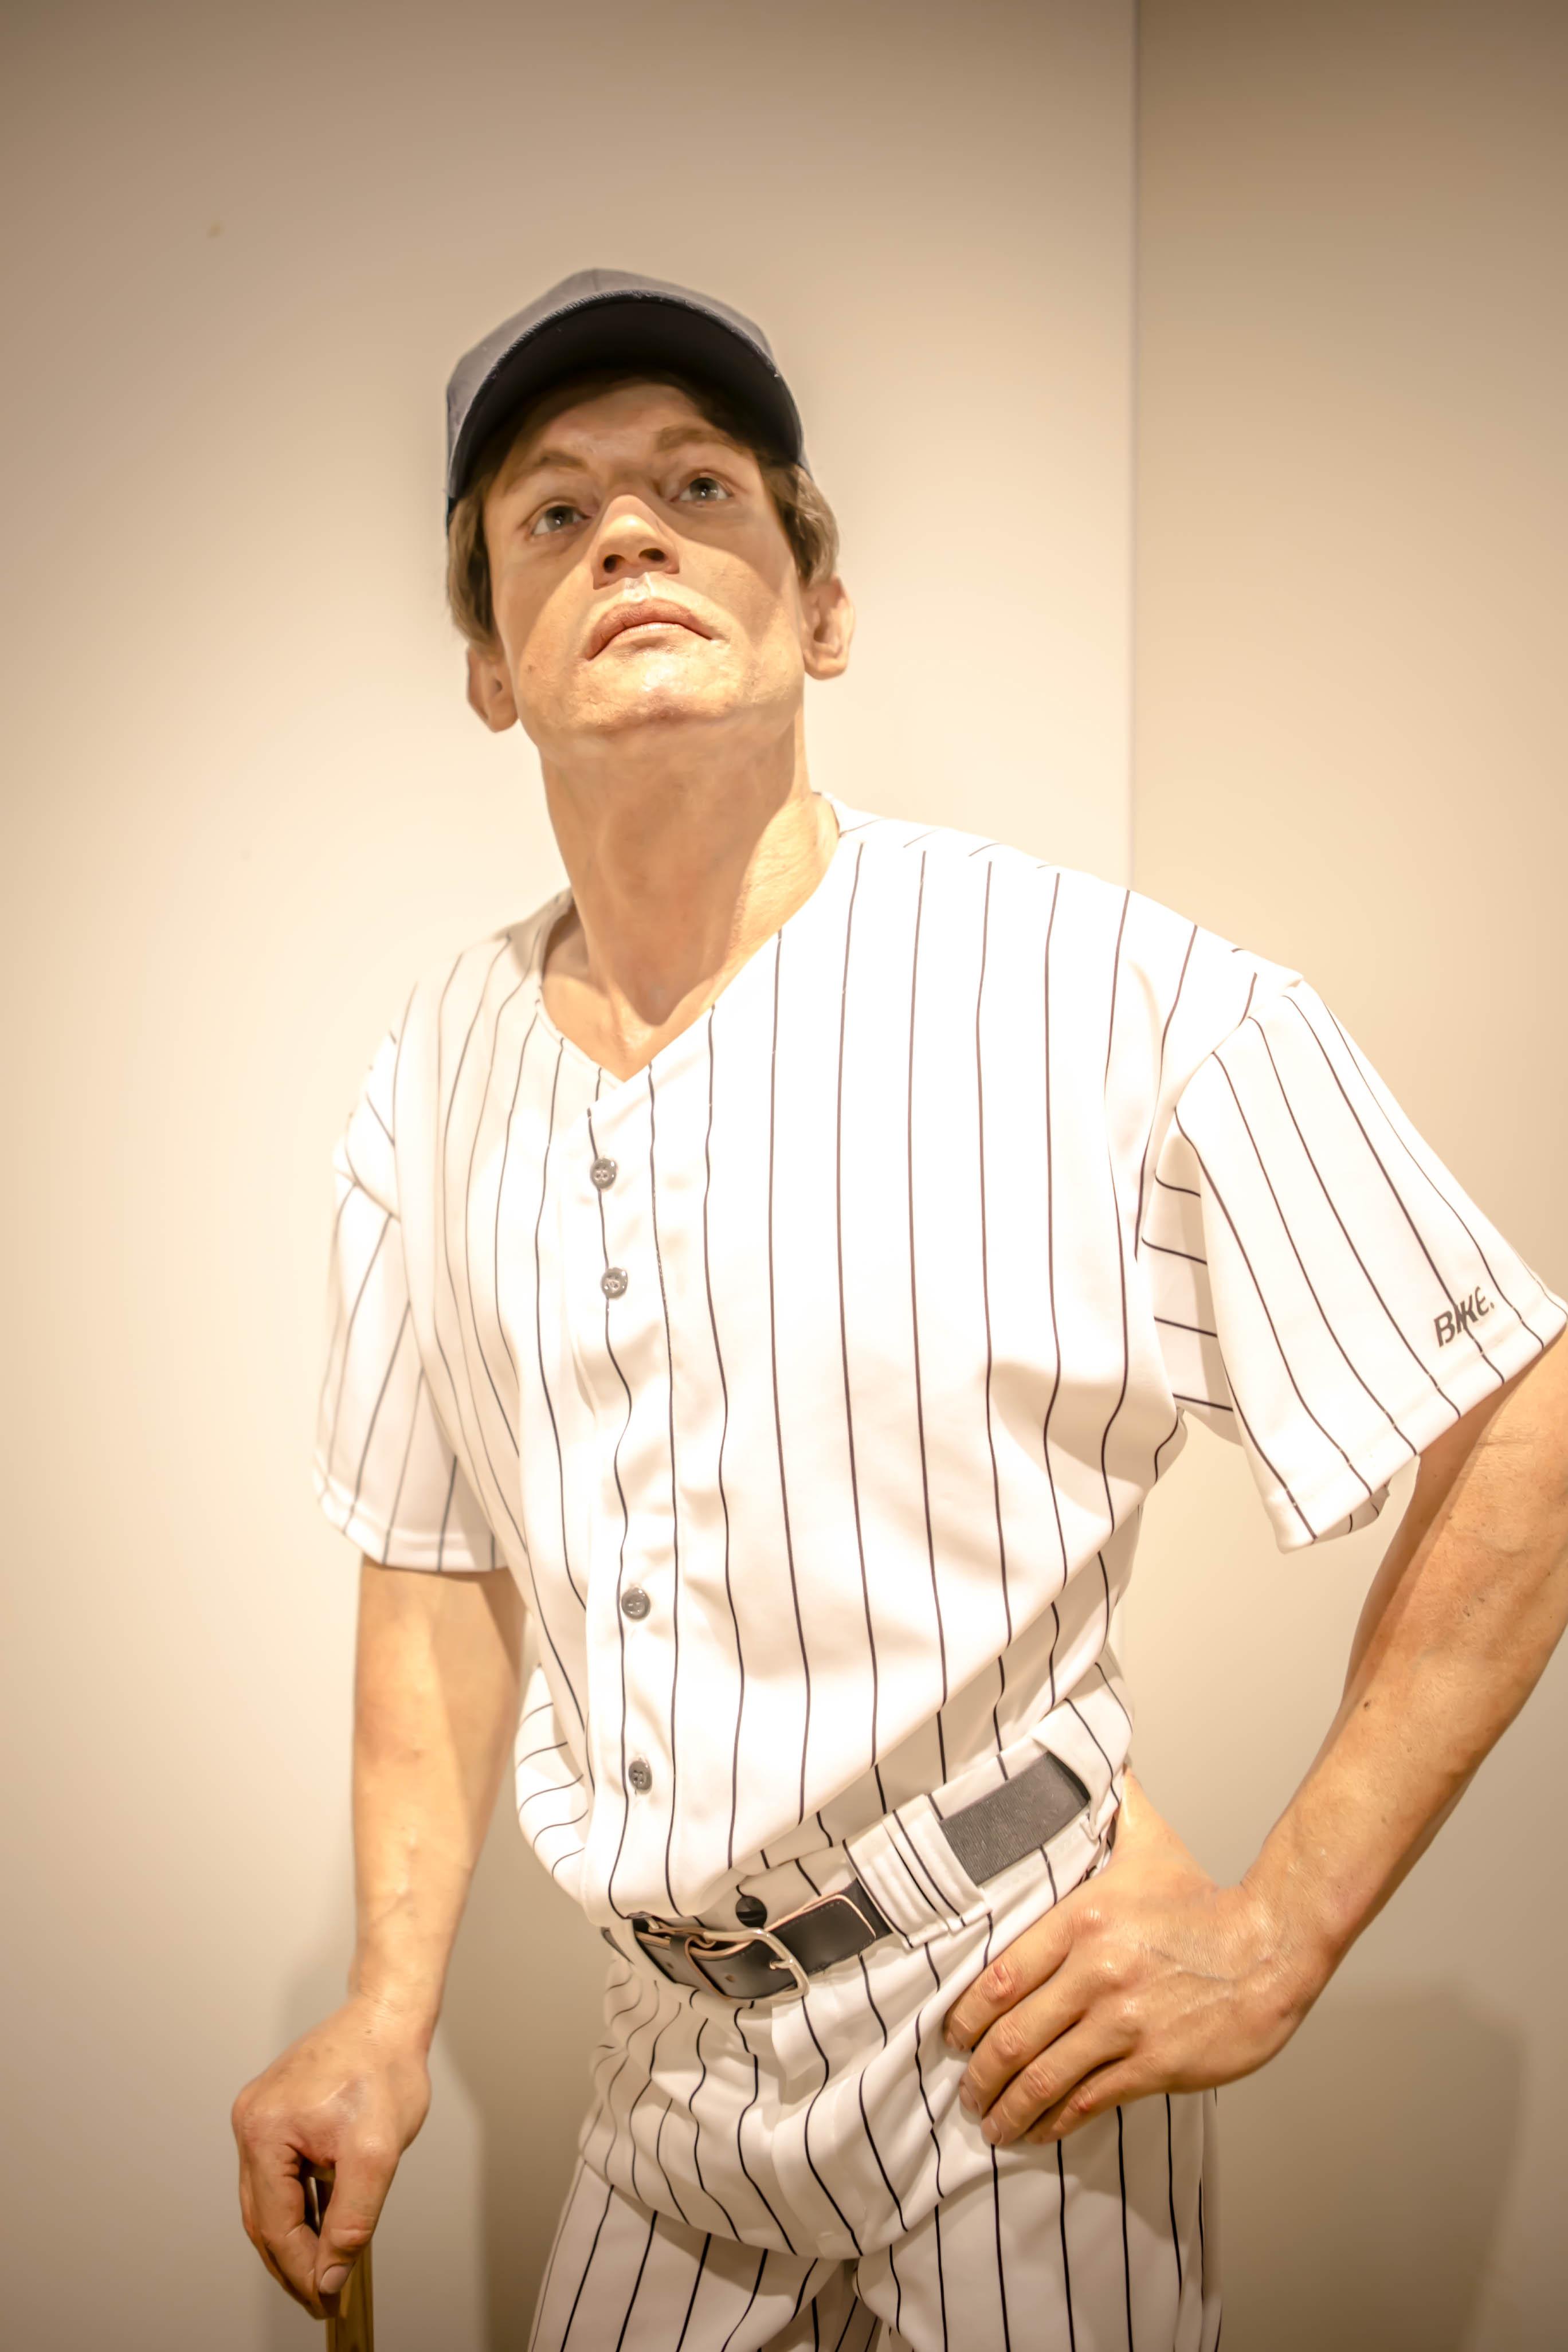 lifelike sculpture of baseball player